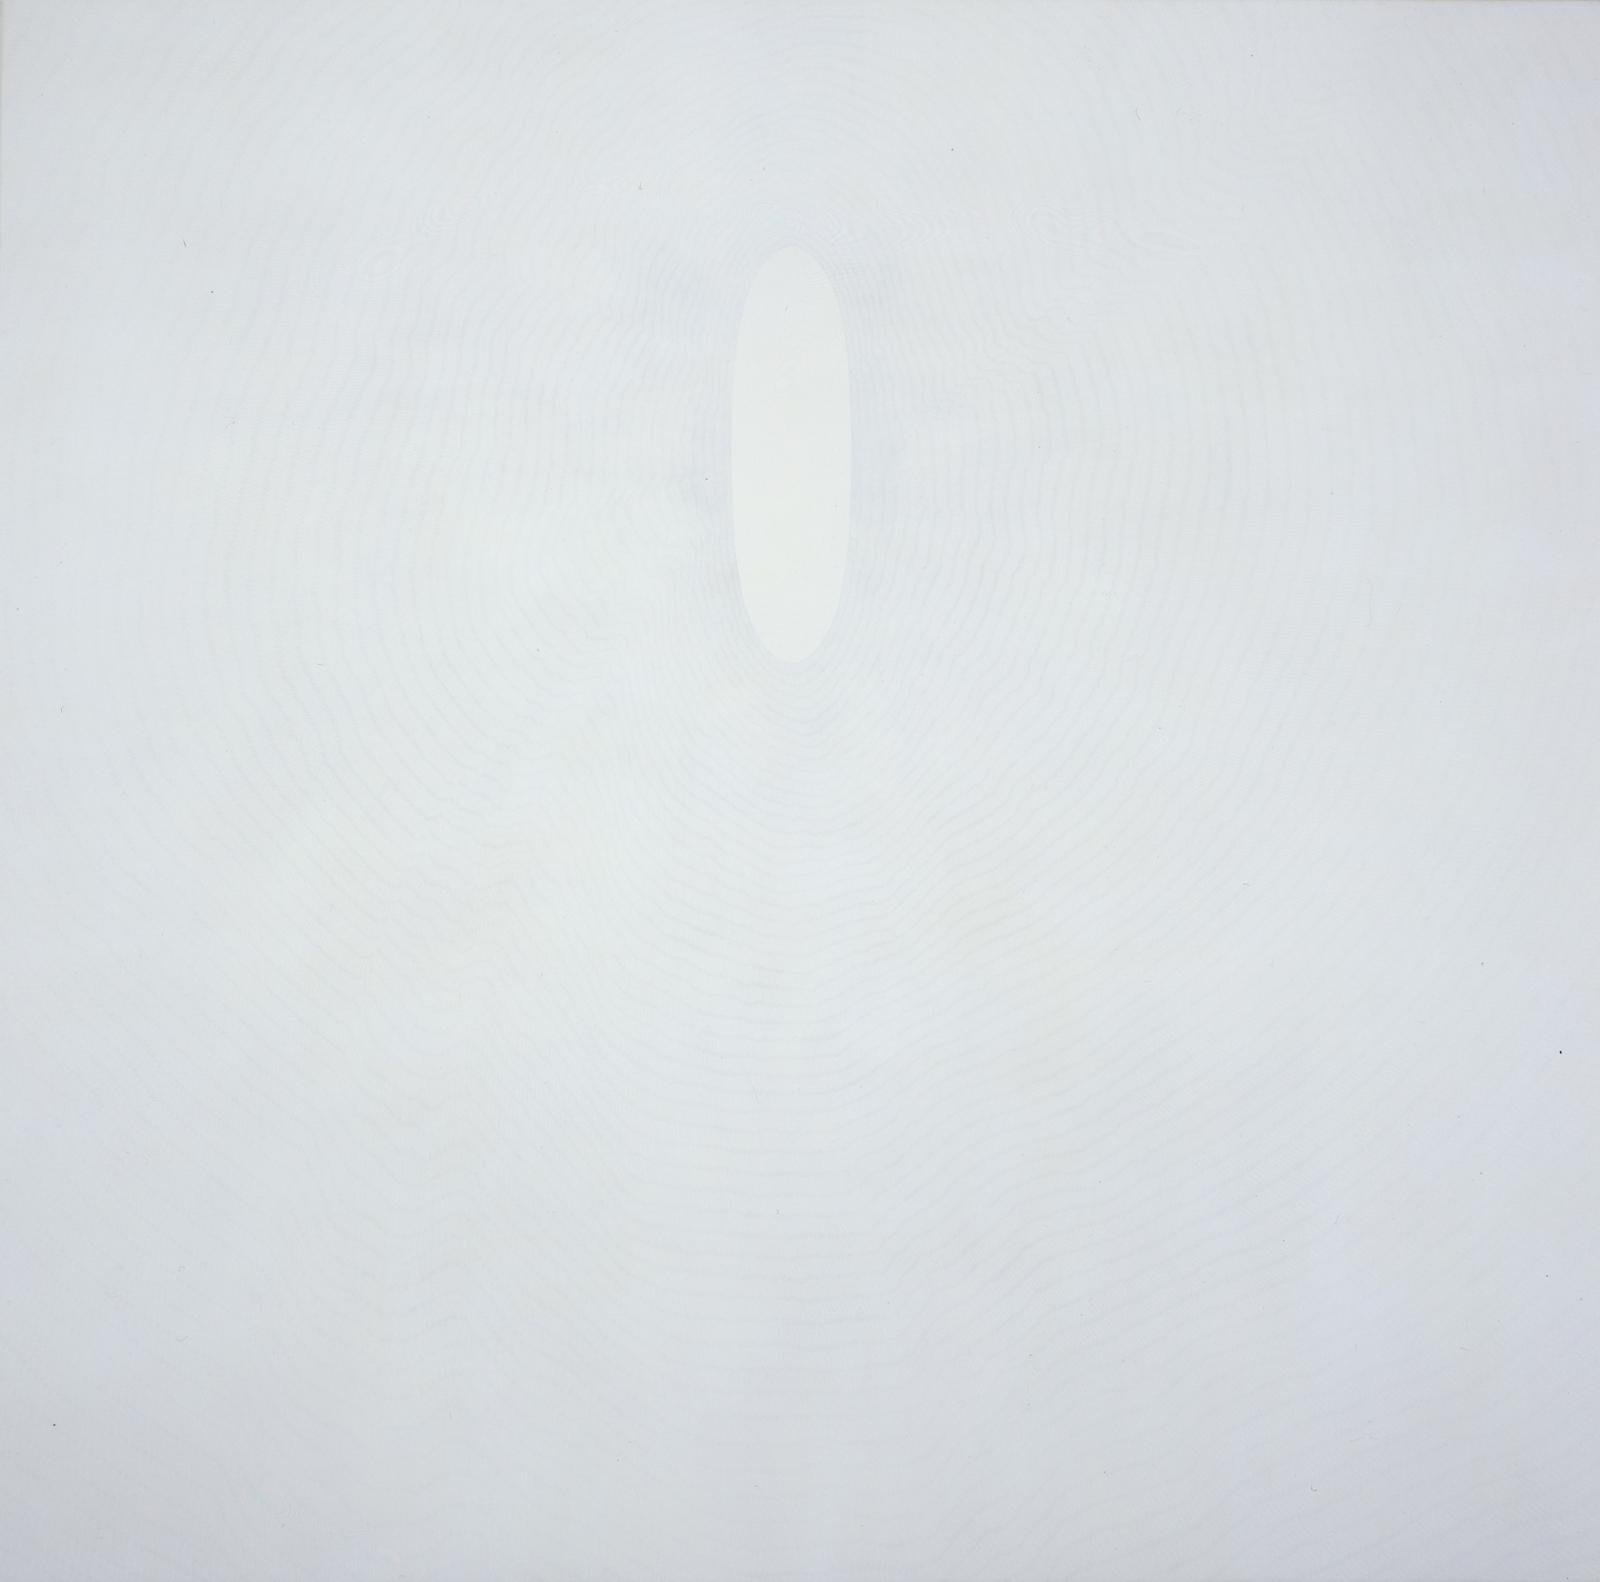 SHIRAZEH HOUSHIARY, White shadow, 1998